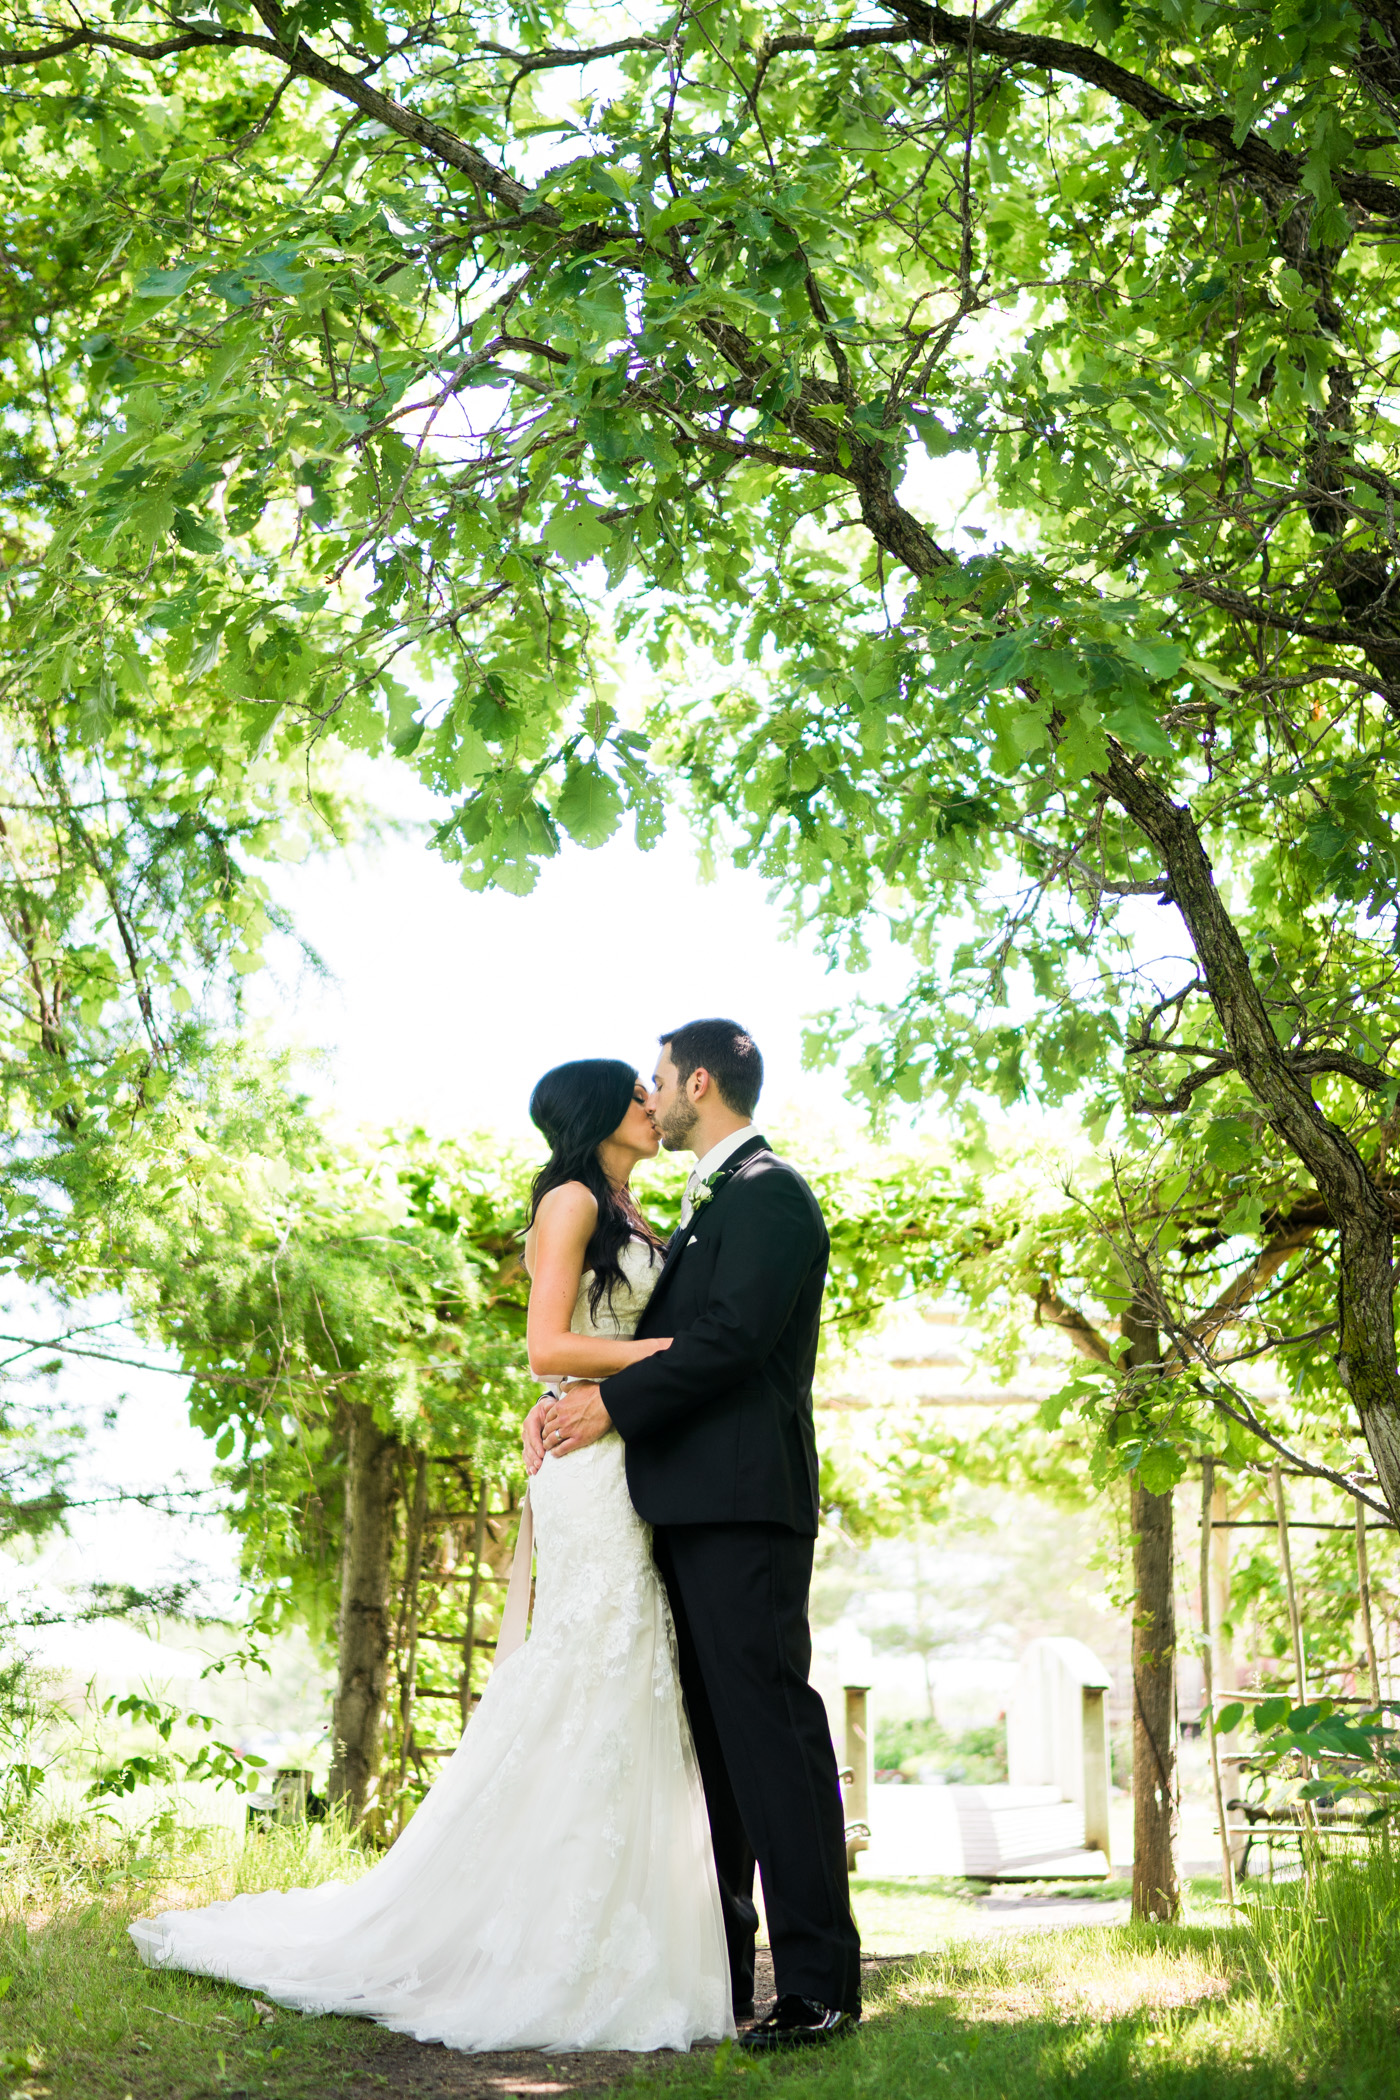 Hillary and Mark - Pineridge Hollow Wedding - Cojo Photo-1339.jpg